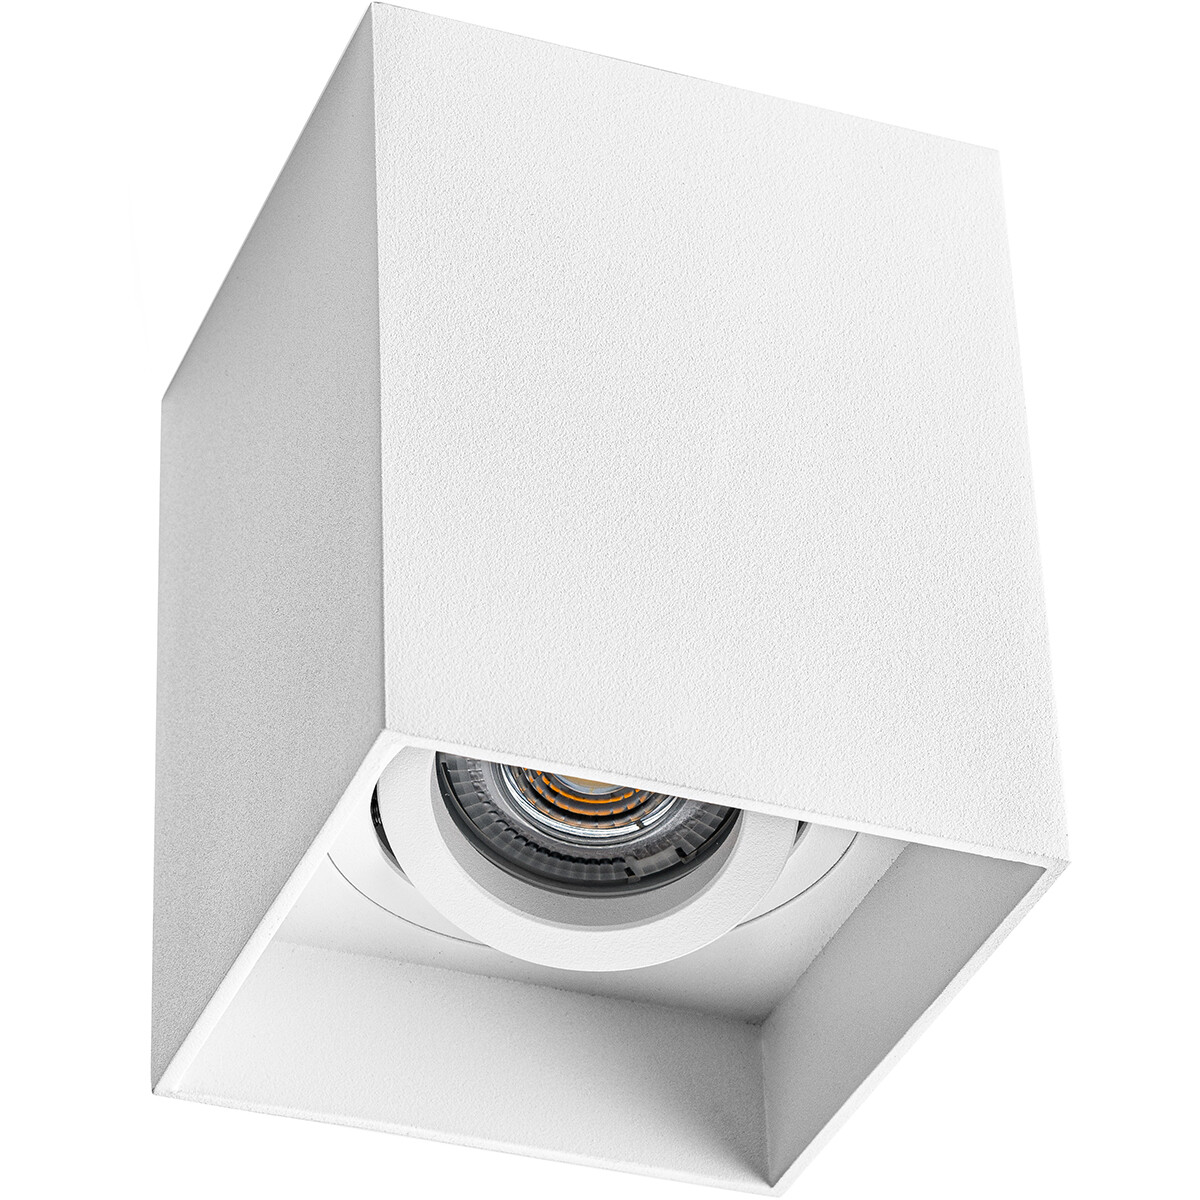 Opbouwspot GU10 - Pragmi Luxina Pro - Opbouw Vierkant - Mat Wit - Aluminium - Verdiept - Kantelbaar